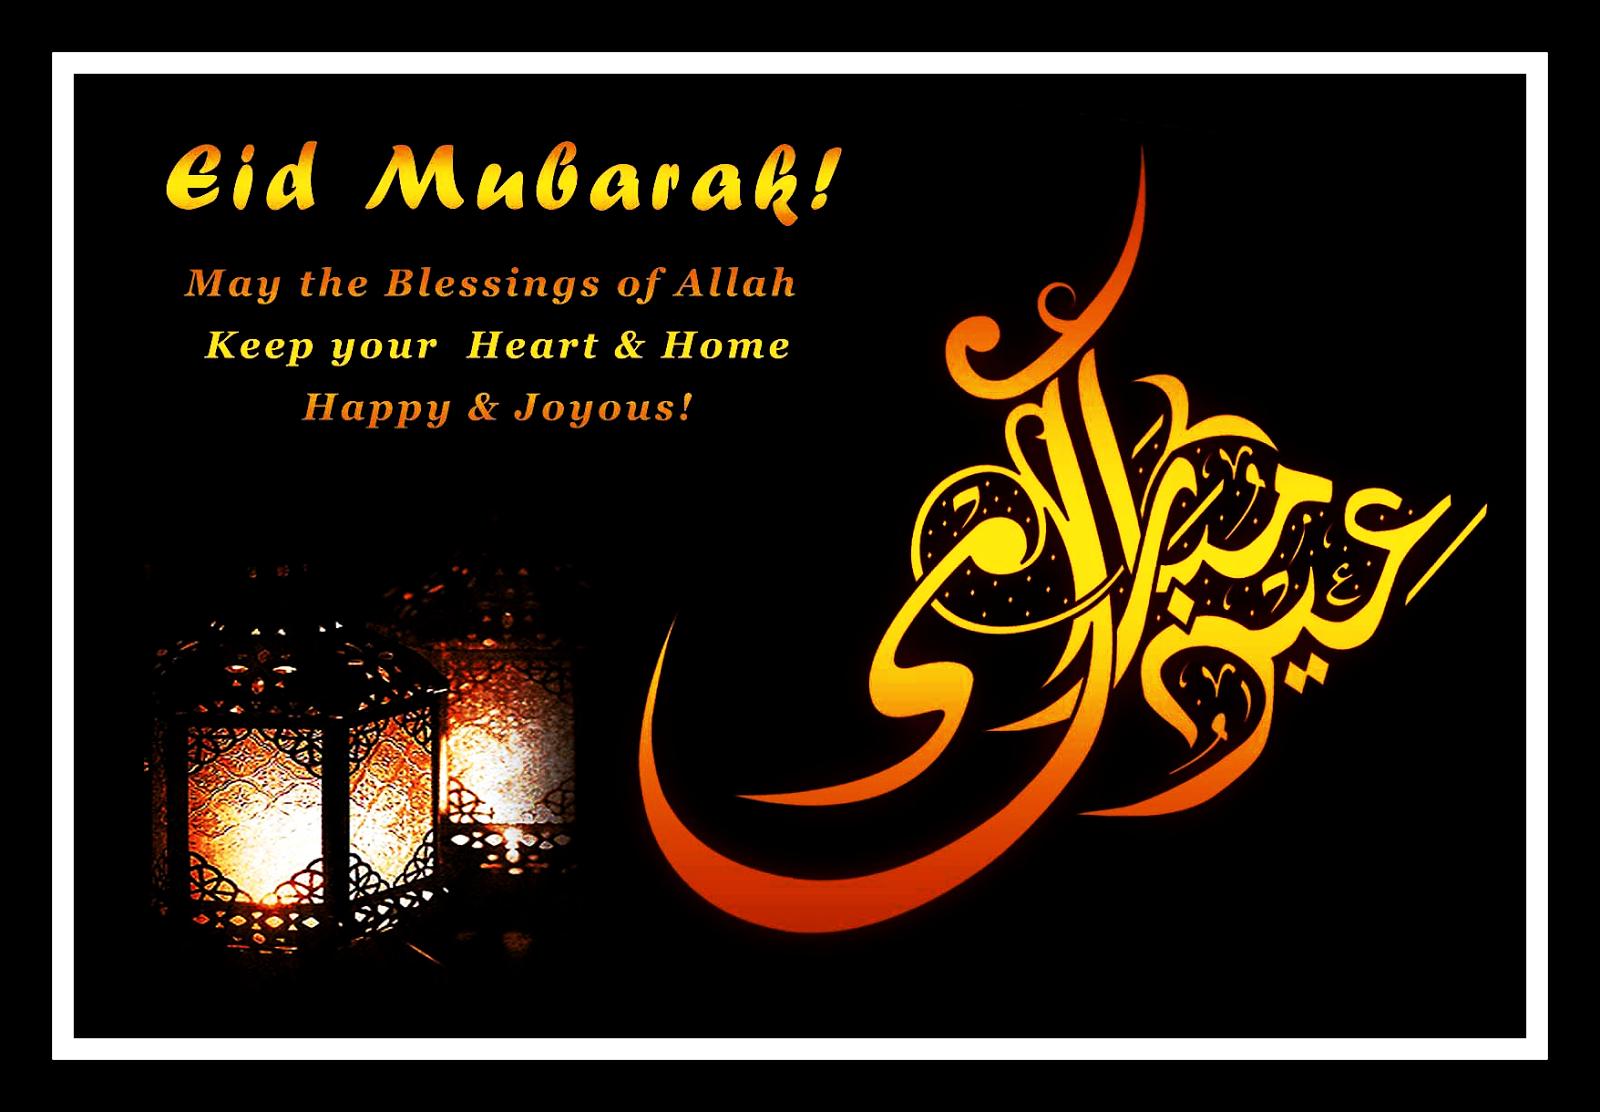 Eid mubarak поздравления картинки 74